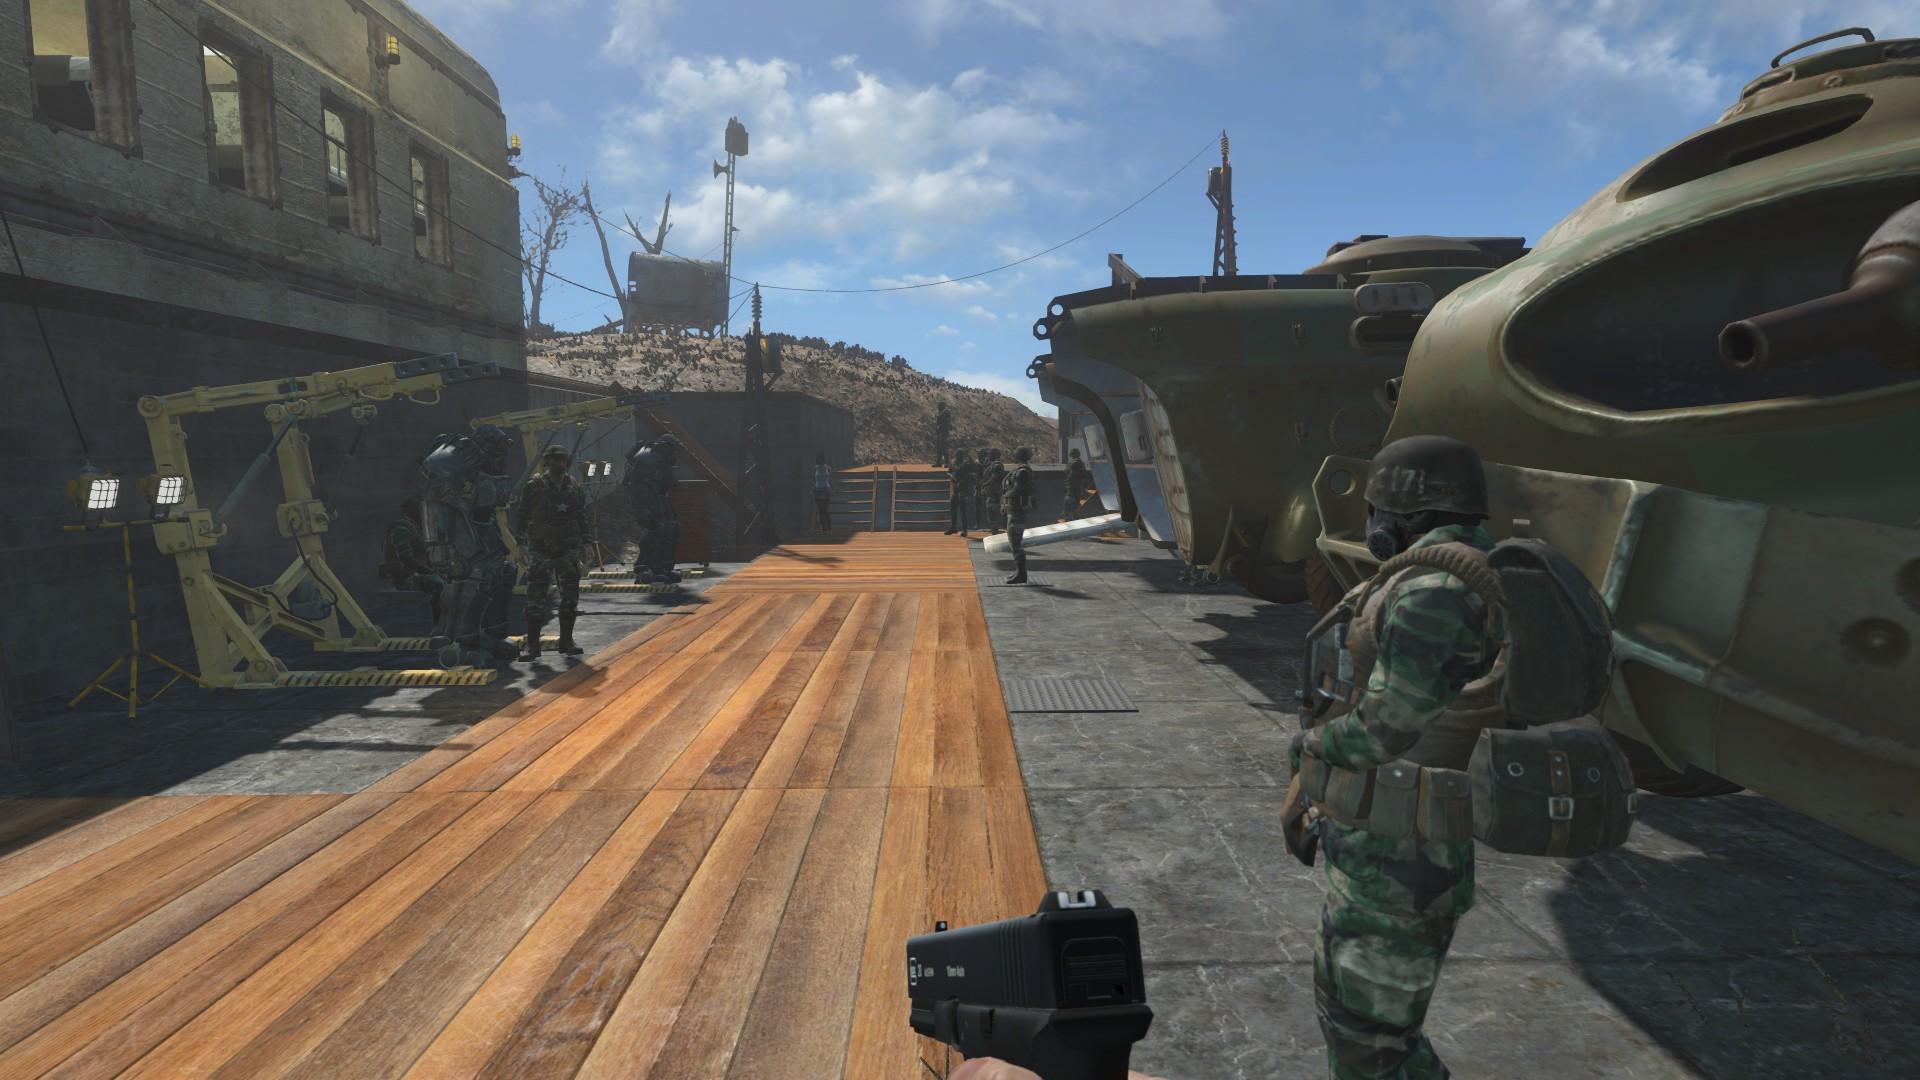 Show your Fallout 4 Settlements! BA51CF4B88414B63F5EE9F92ACB7824E24E3401C